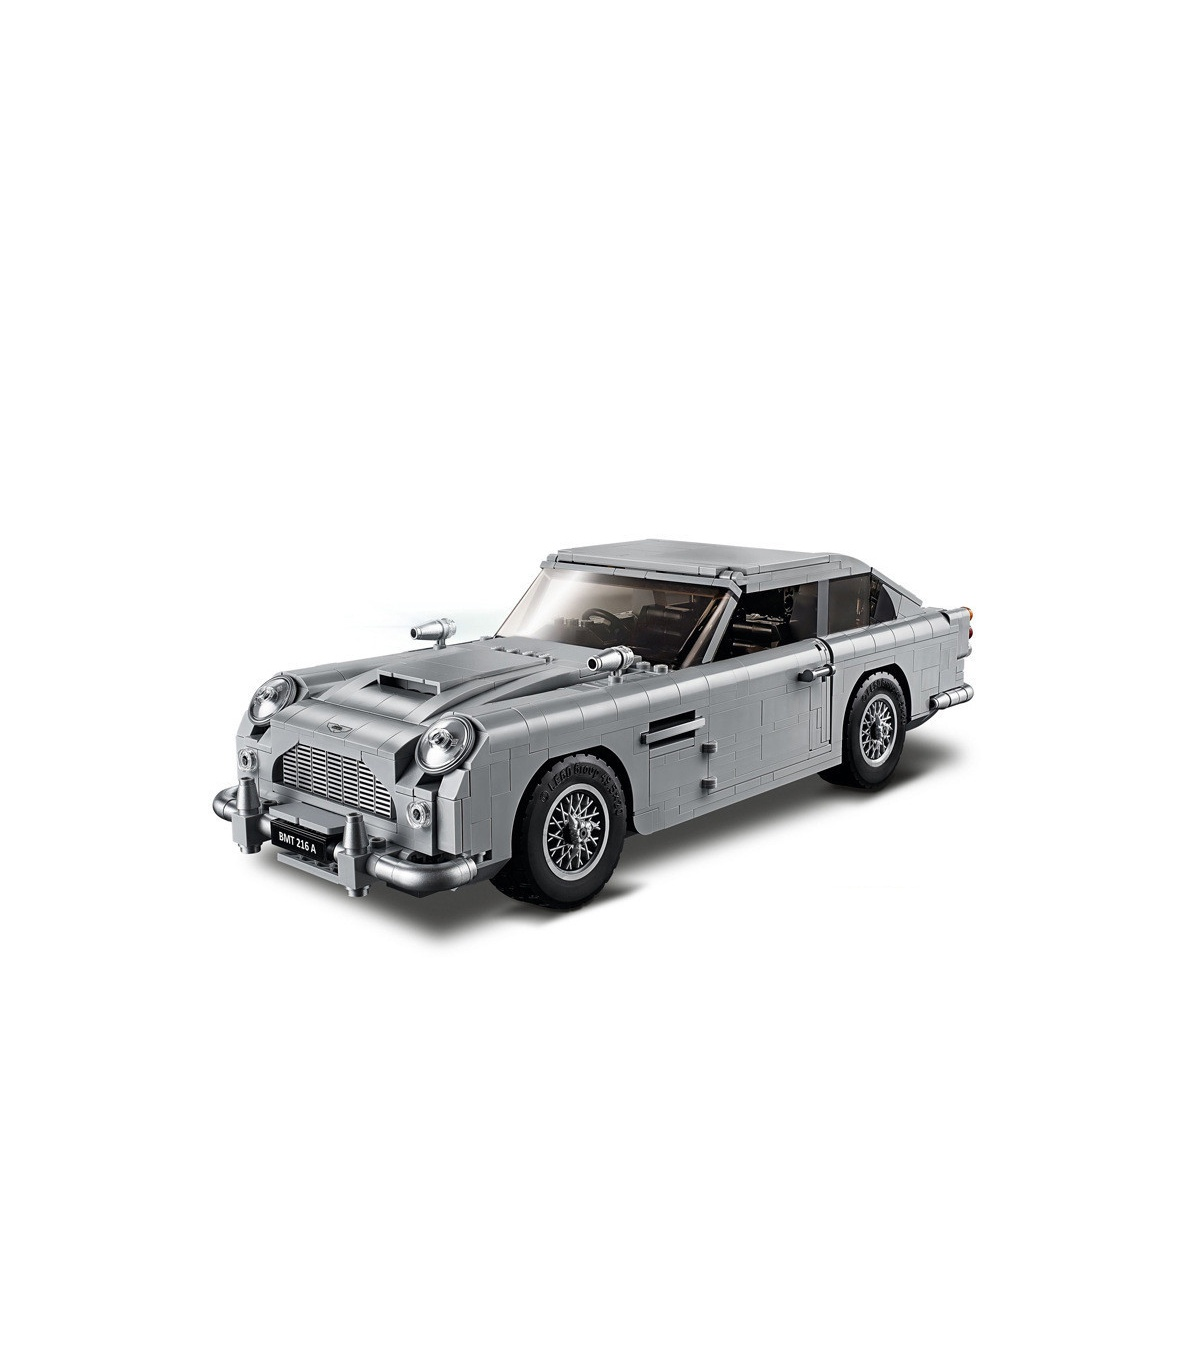 Custom James Bond Aston Martin Db5 Building Bricks Toy Set Buildingtoystore Com